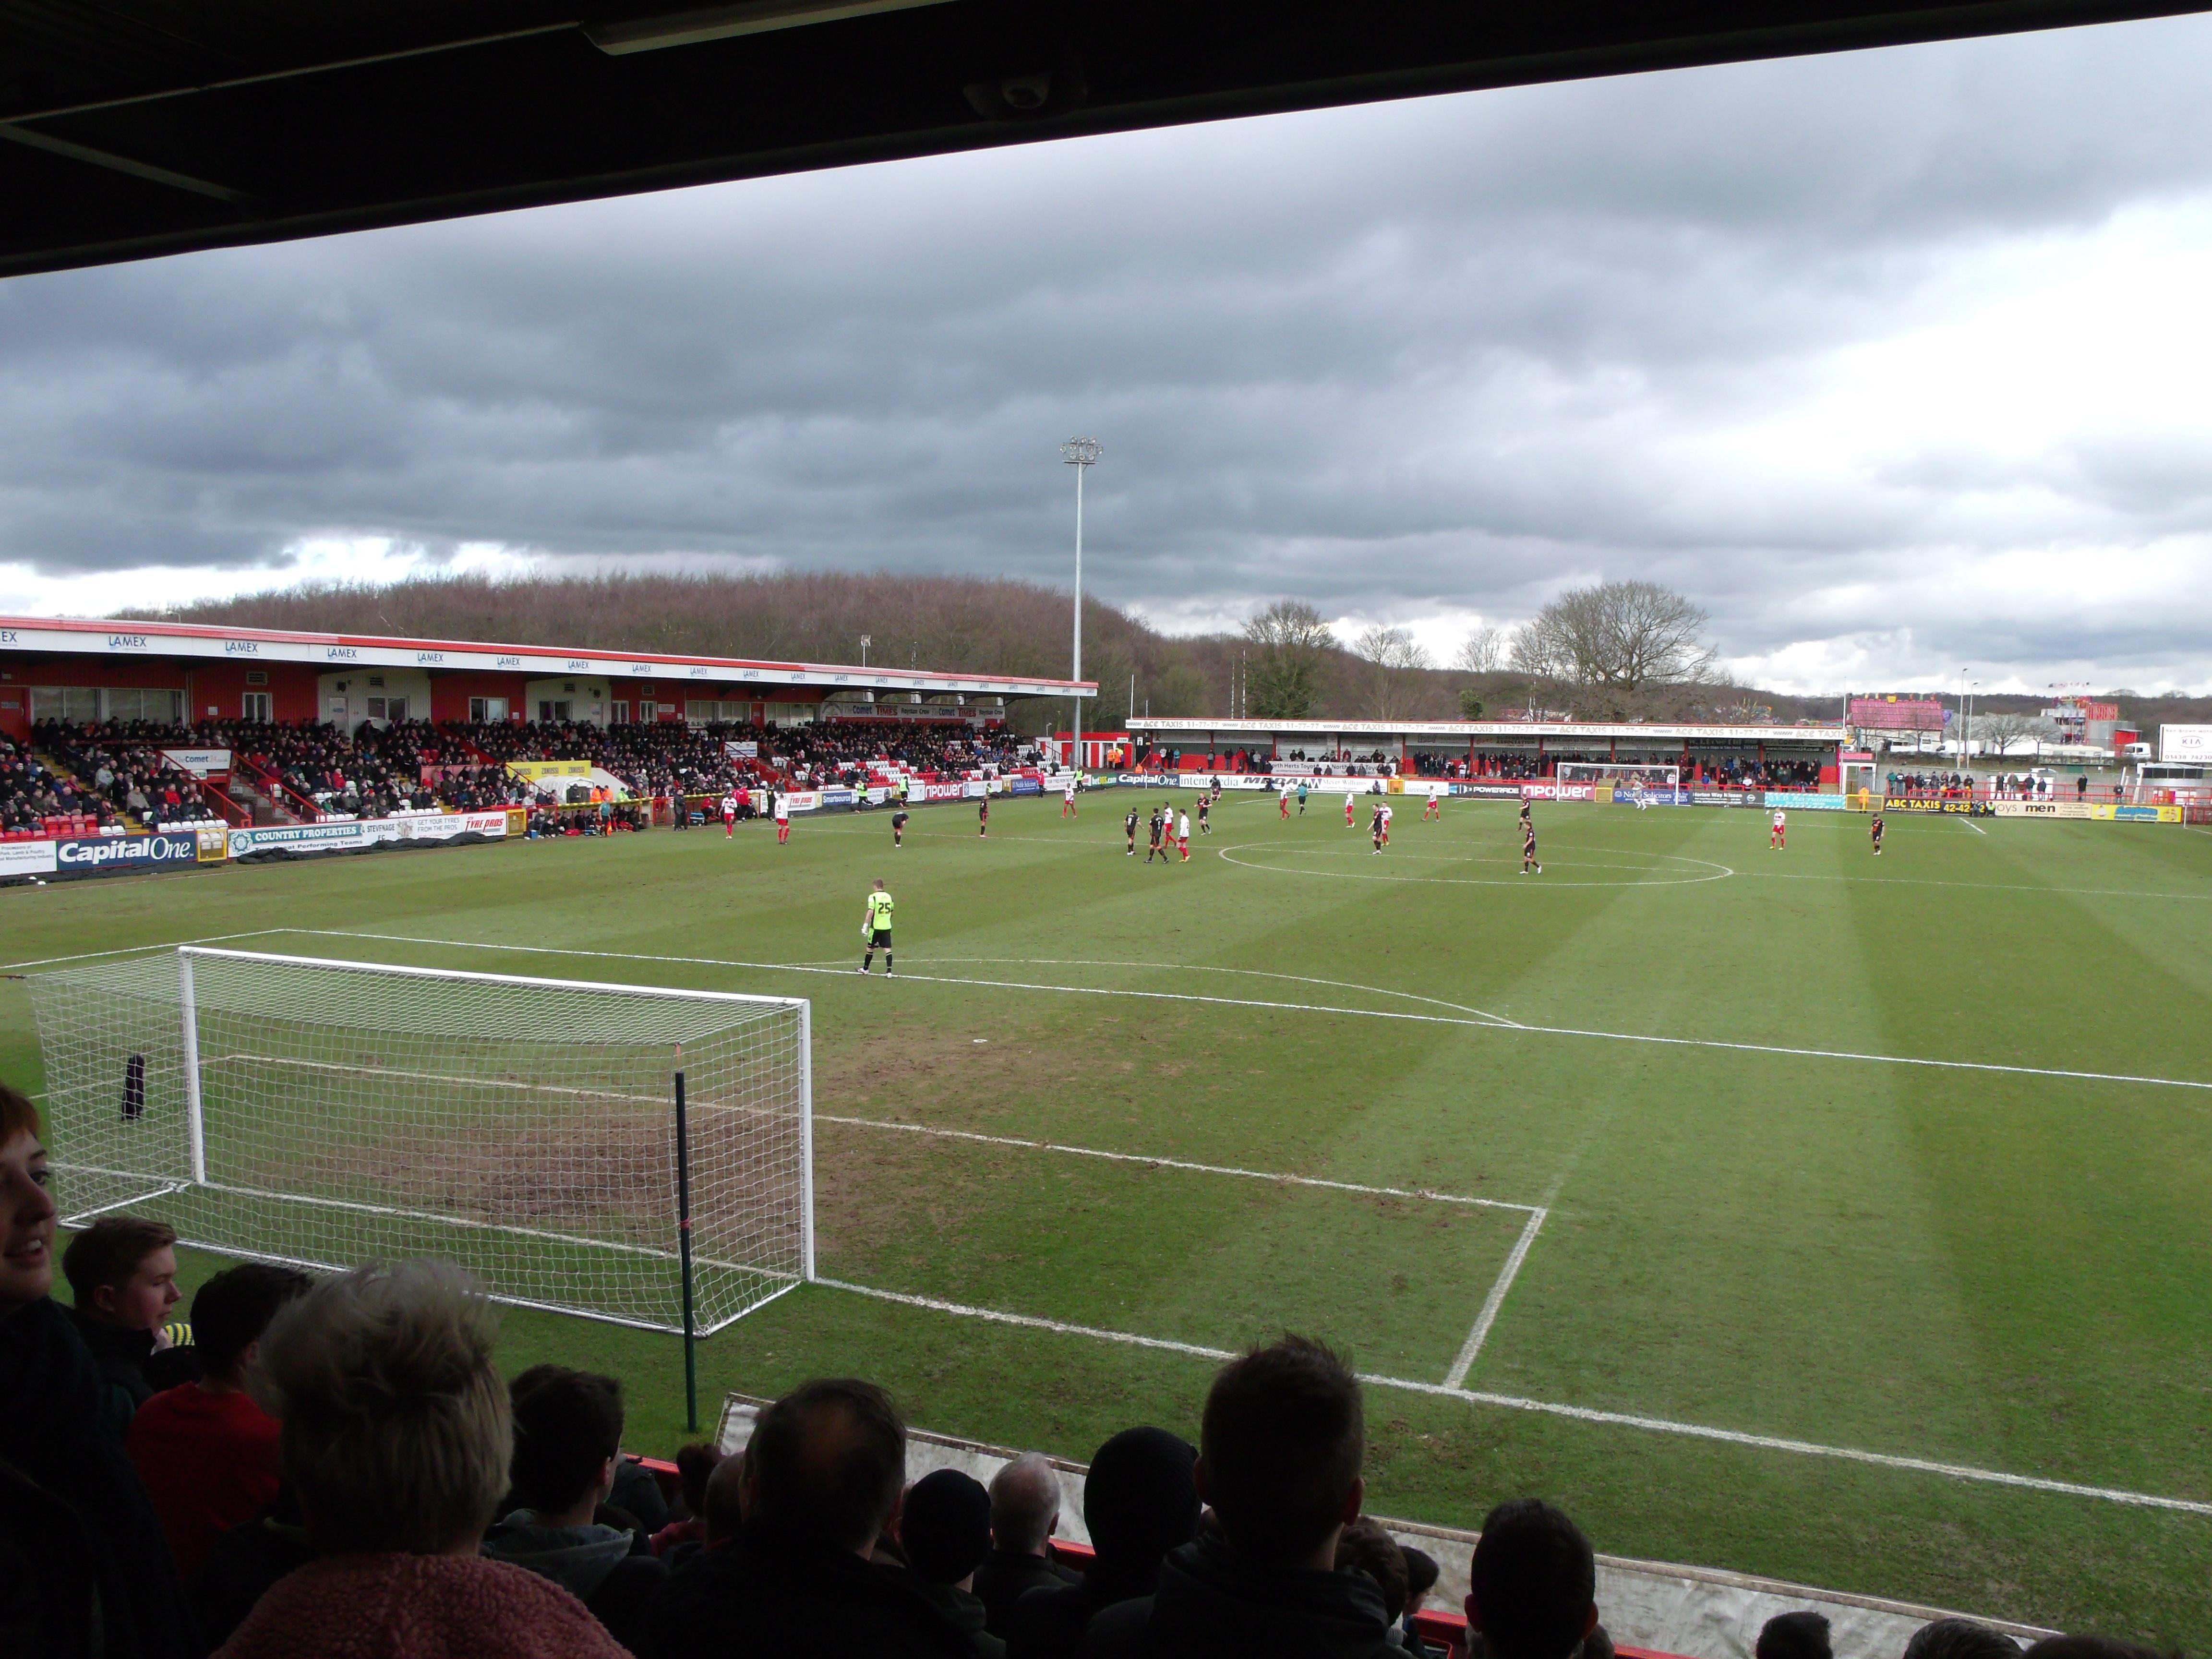 Away Stand B row K seat 32 - Stevenage F.C. vs Sheffield United